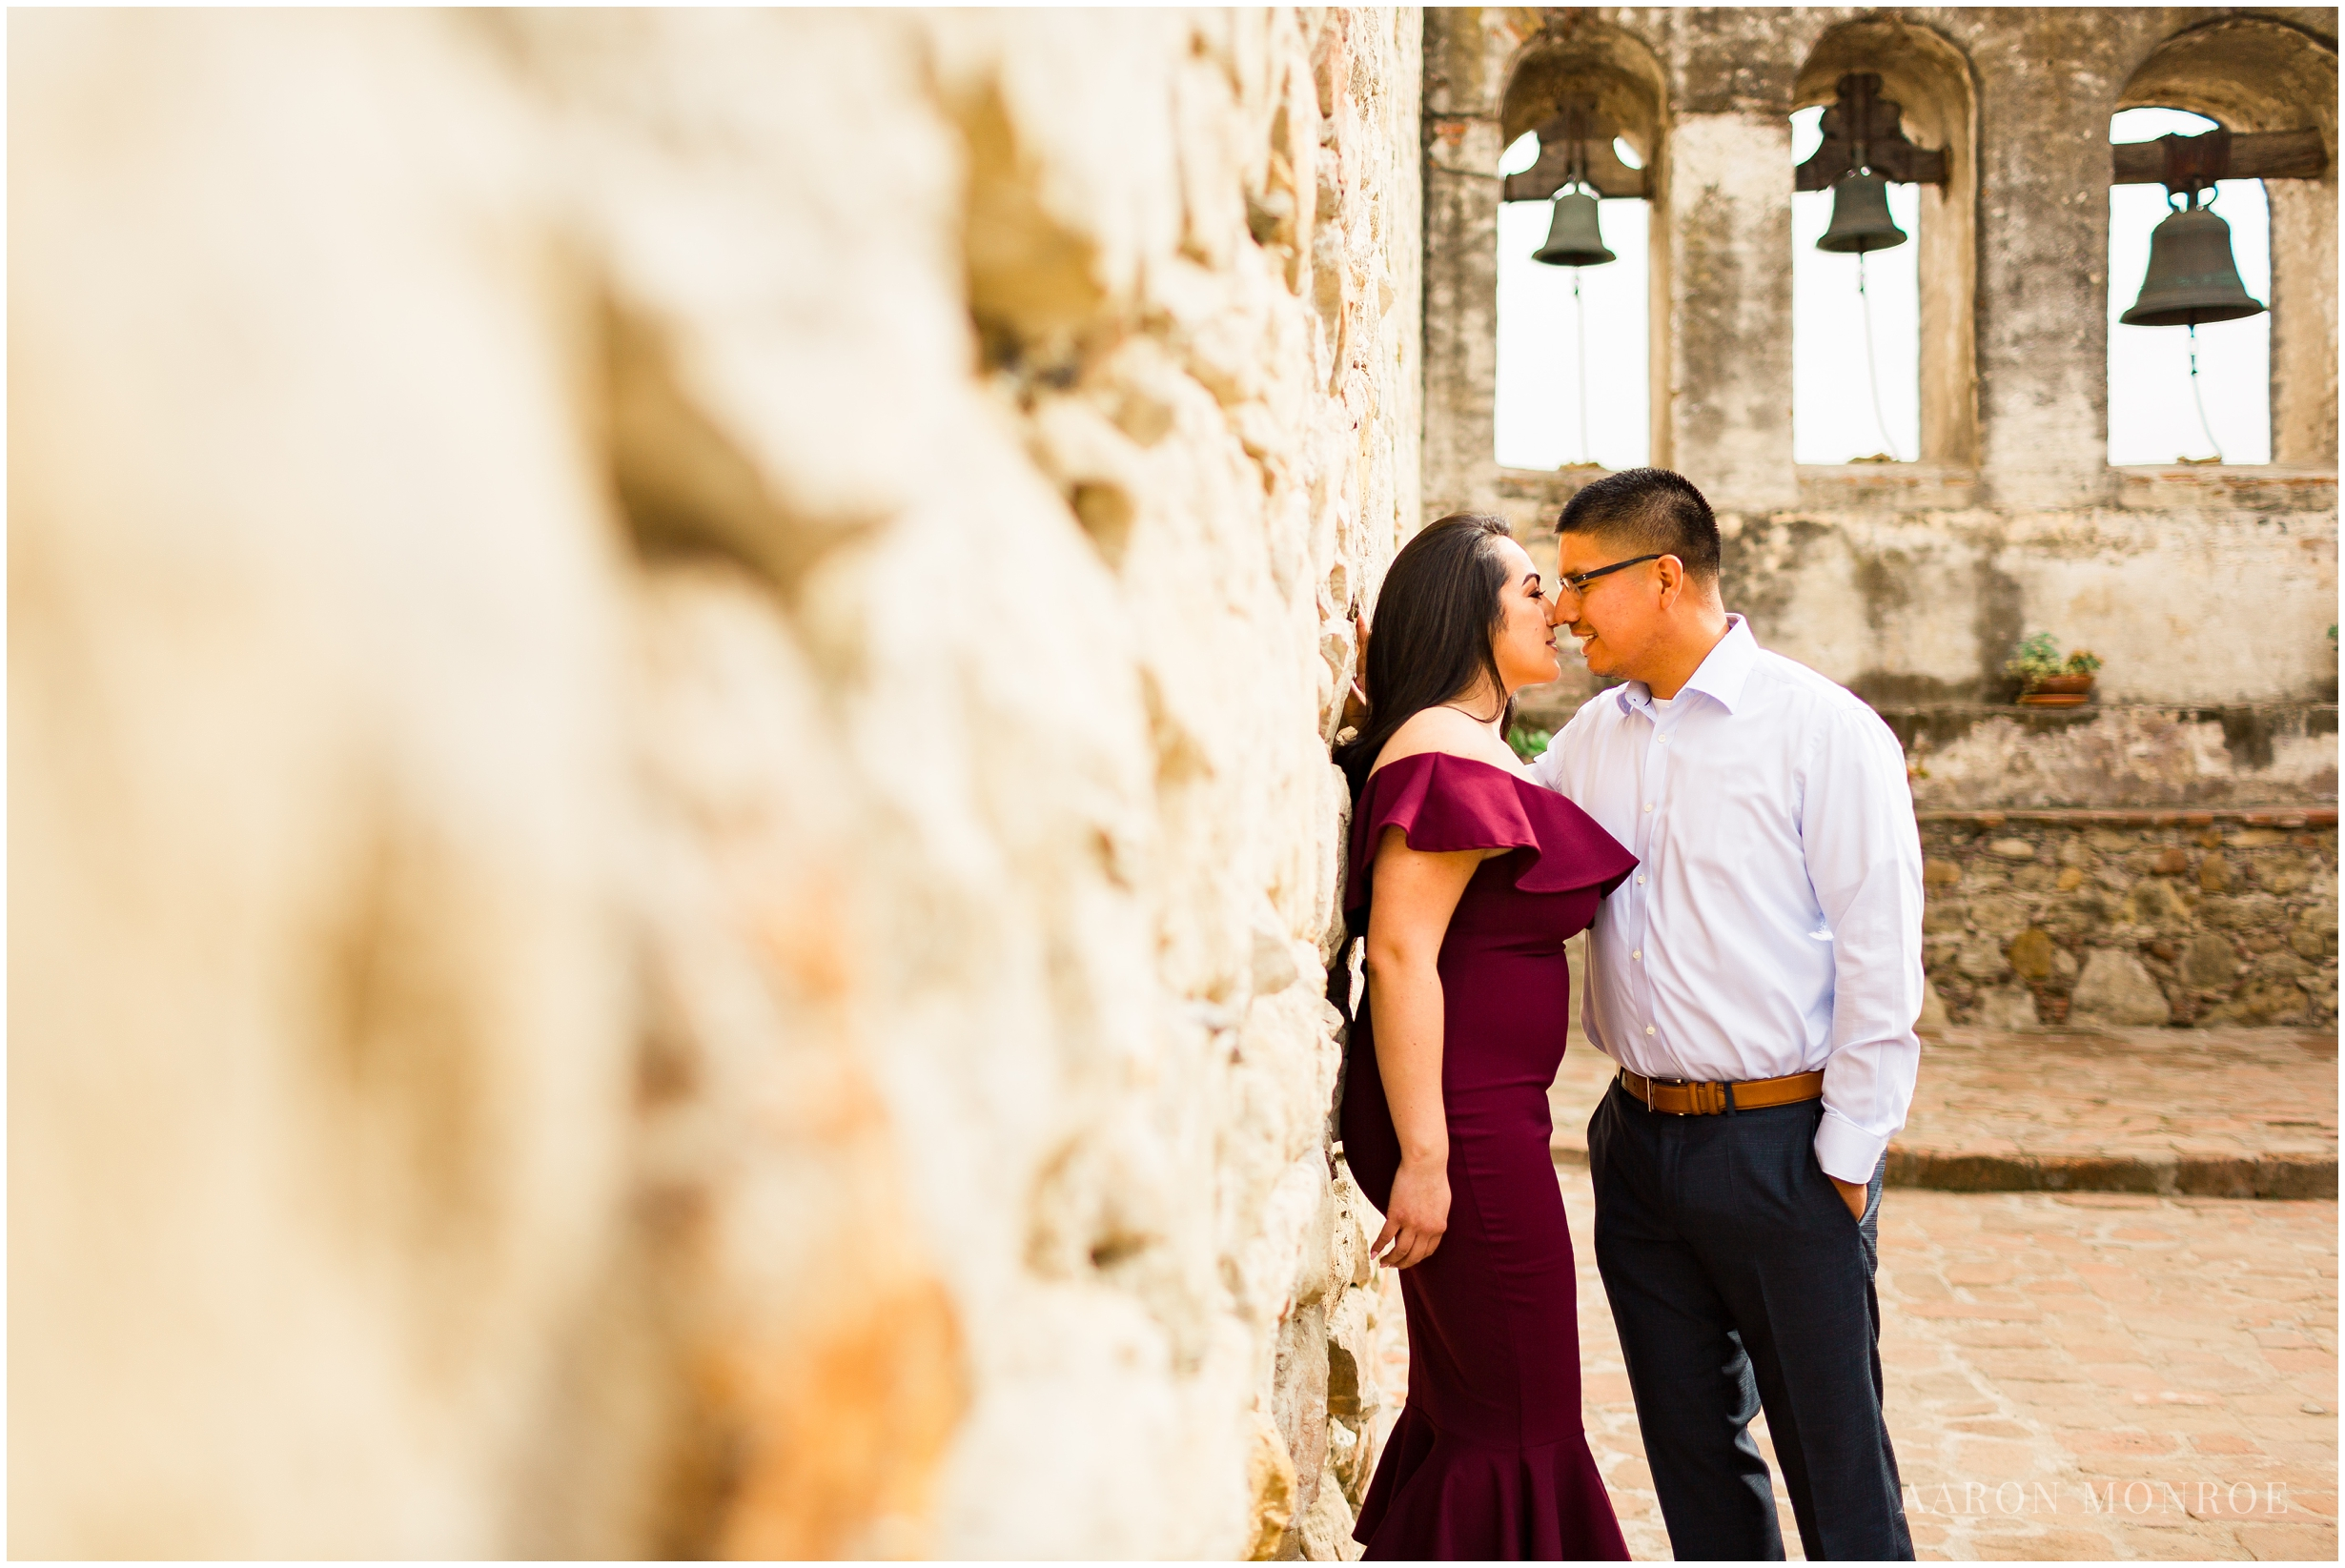 Mission_San_Juan_Capistrano_Engagement_Los_Angeles_Wedding_Photographer_0344.jpg